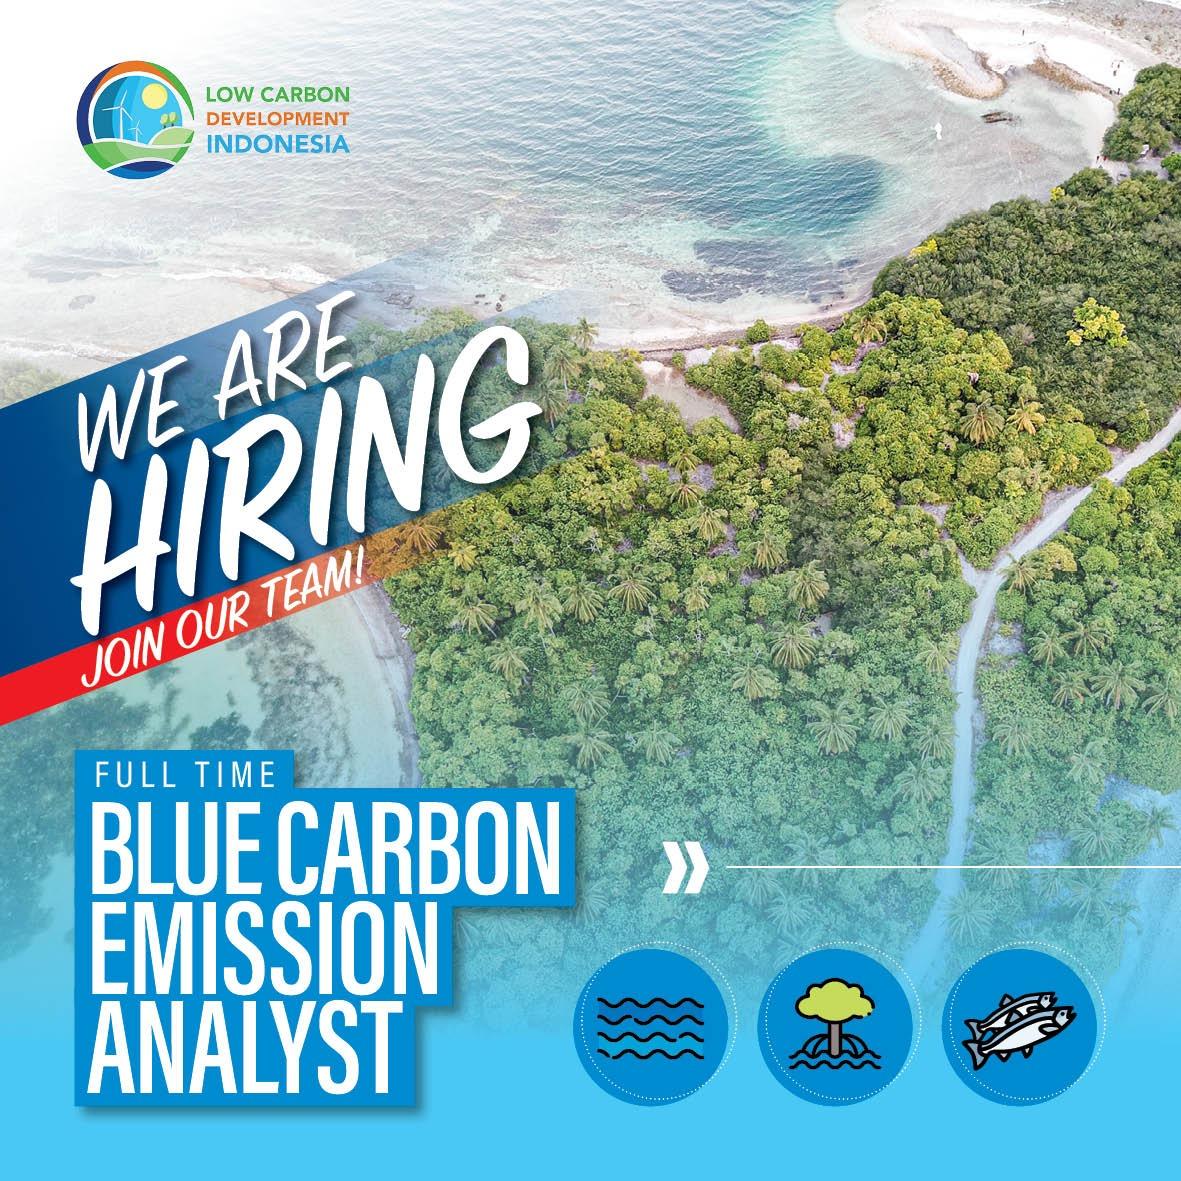 Blue Carbon Emission Analyst